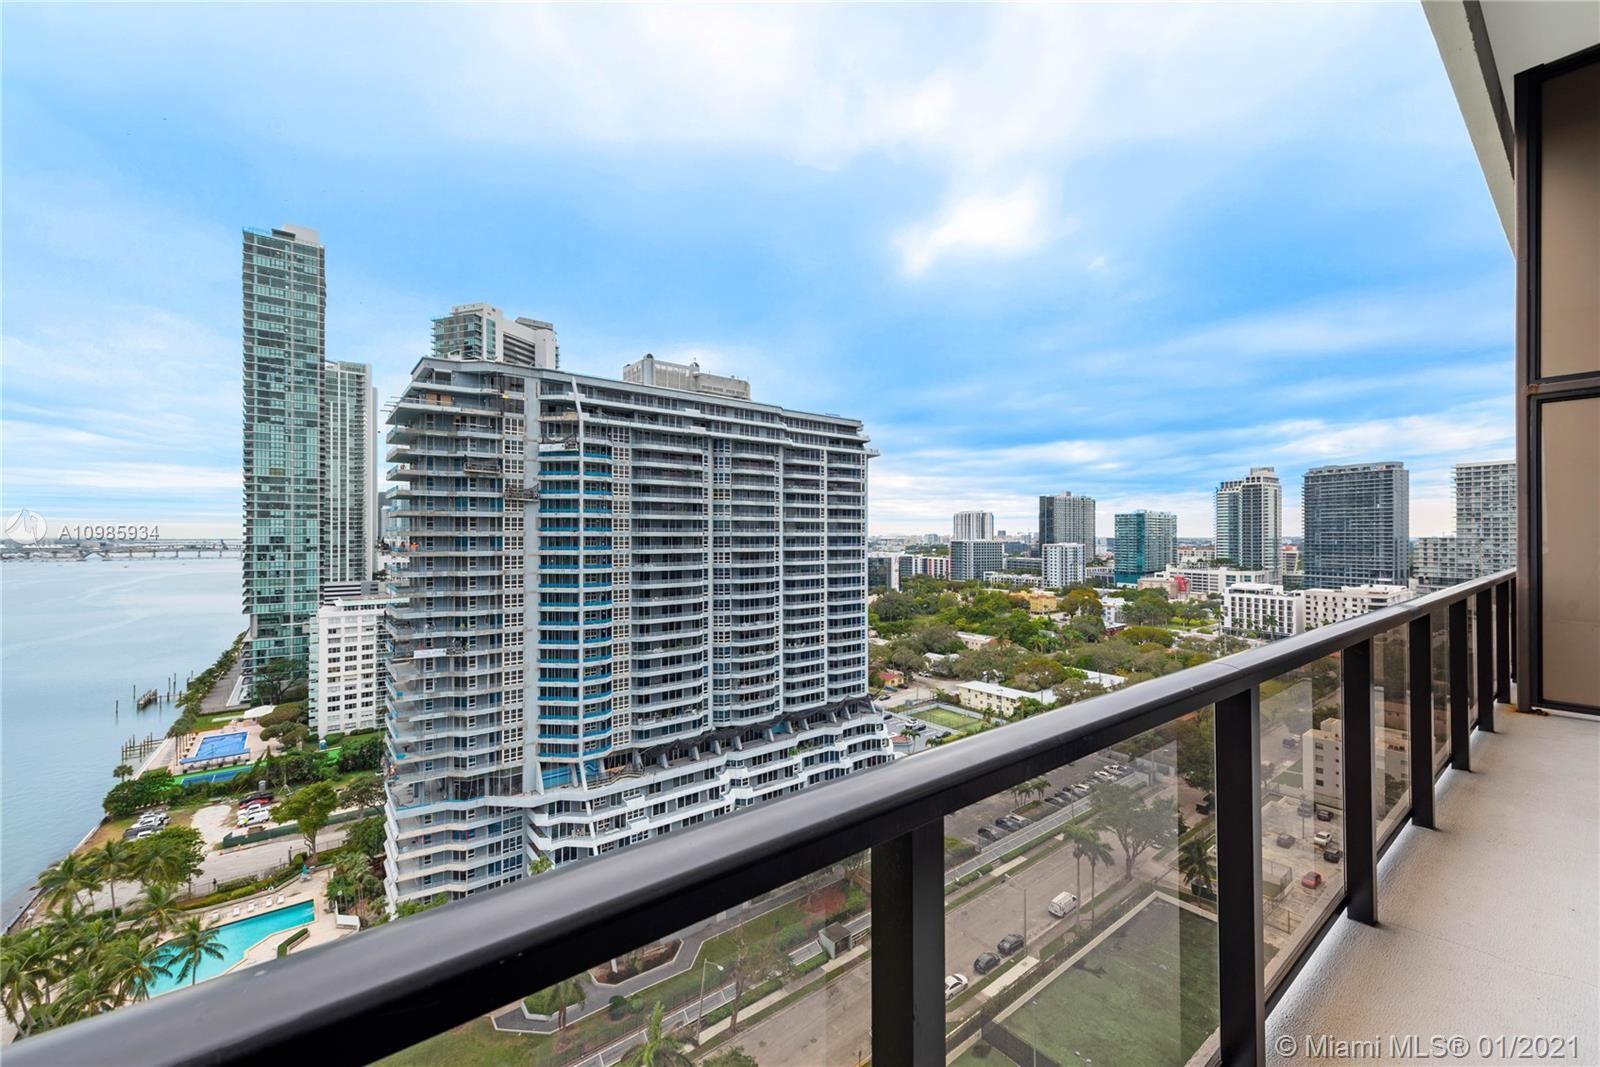 Photo of 600 NE 36th St #PH20, Miami, FL 33137 (MLS # A10985934)